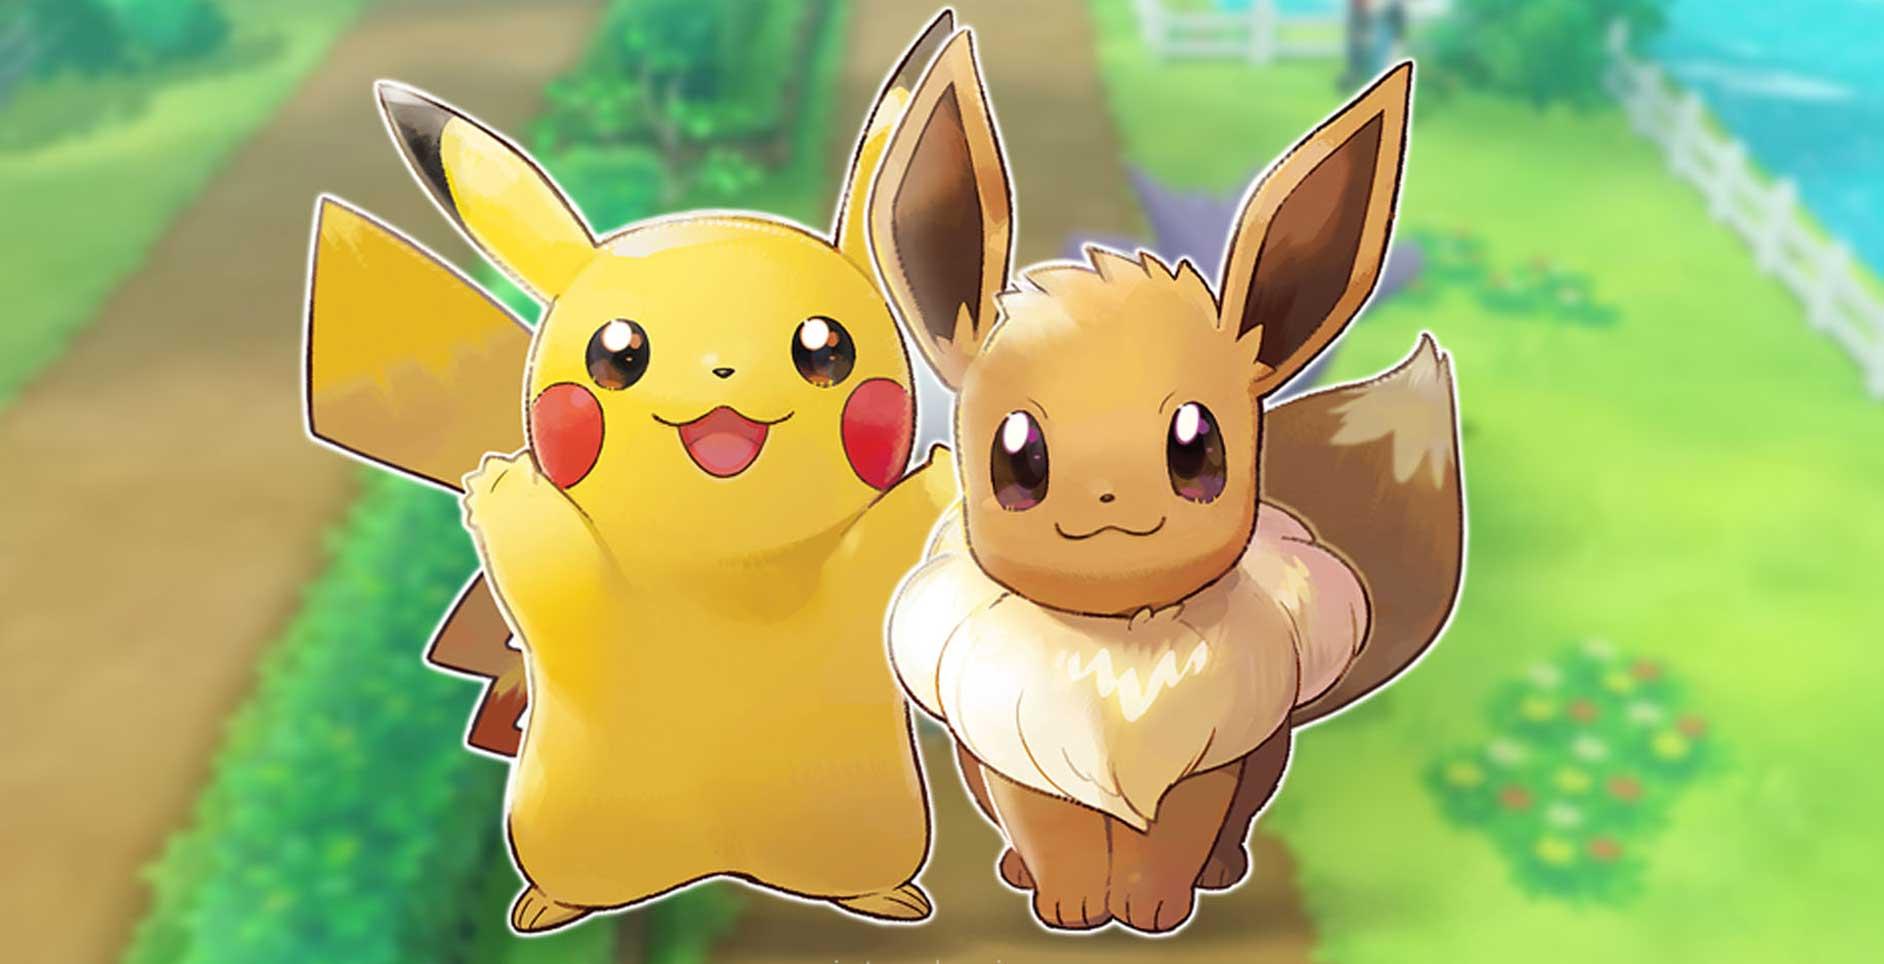 'Pokemon' Donates $100K to Both NCAACP & Black Lives Matter